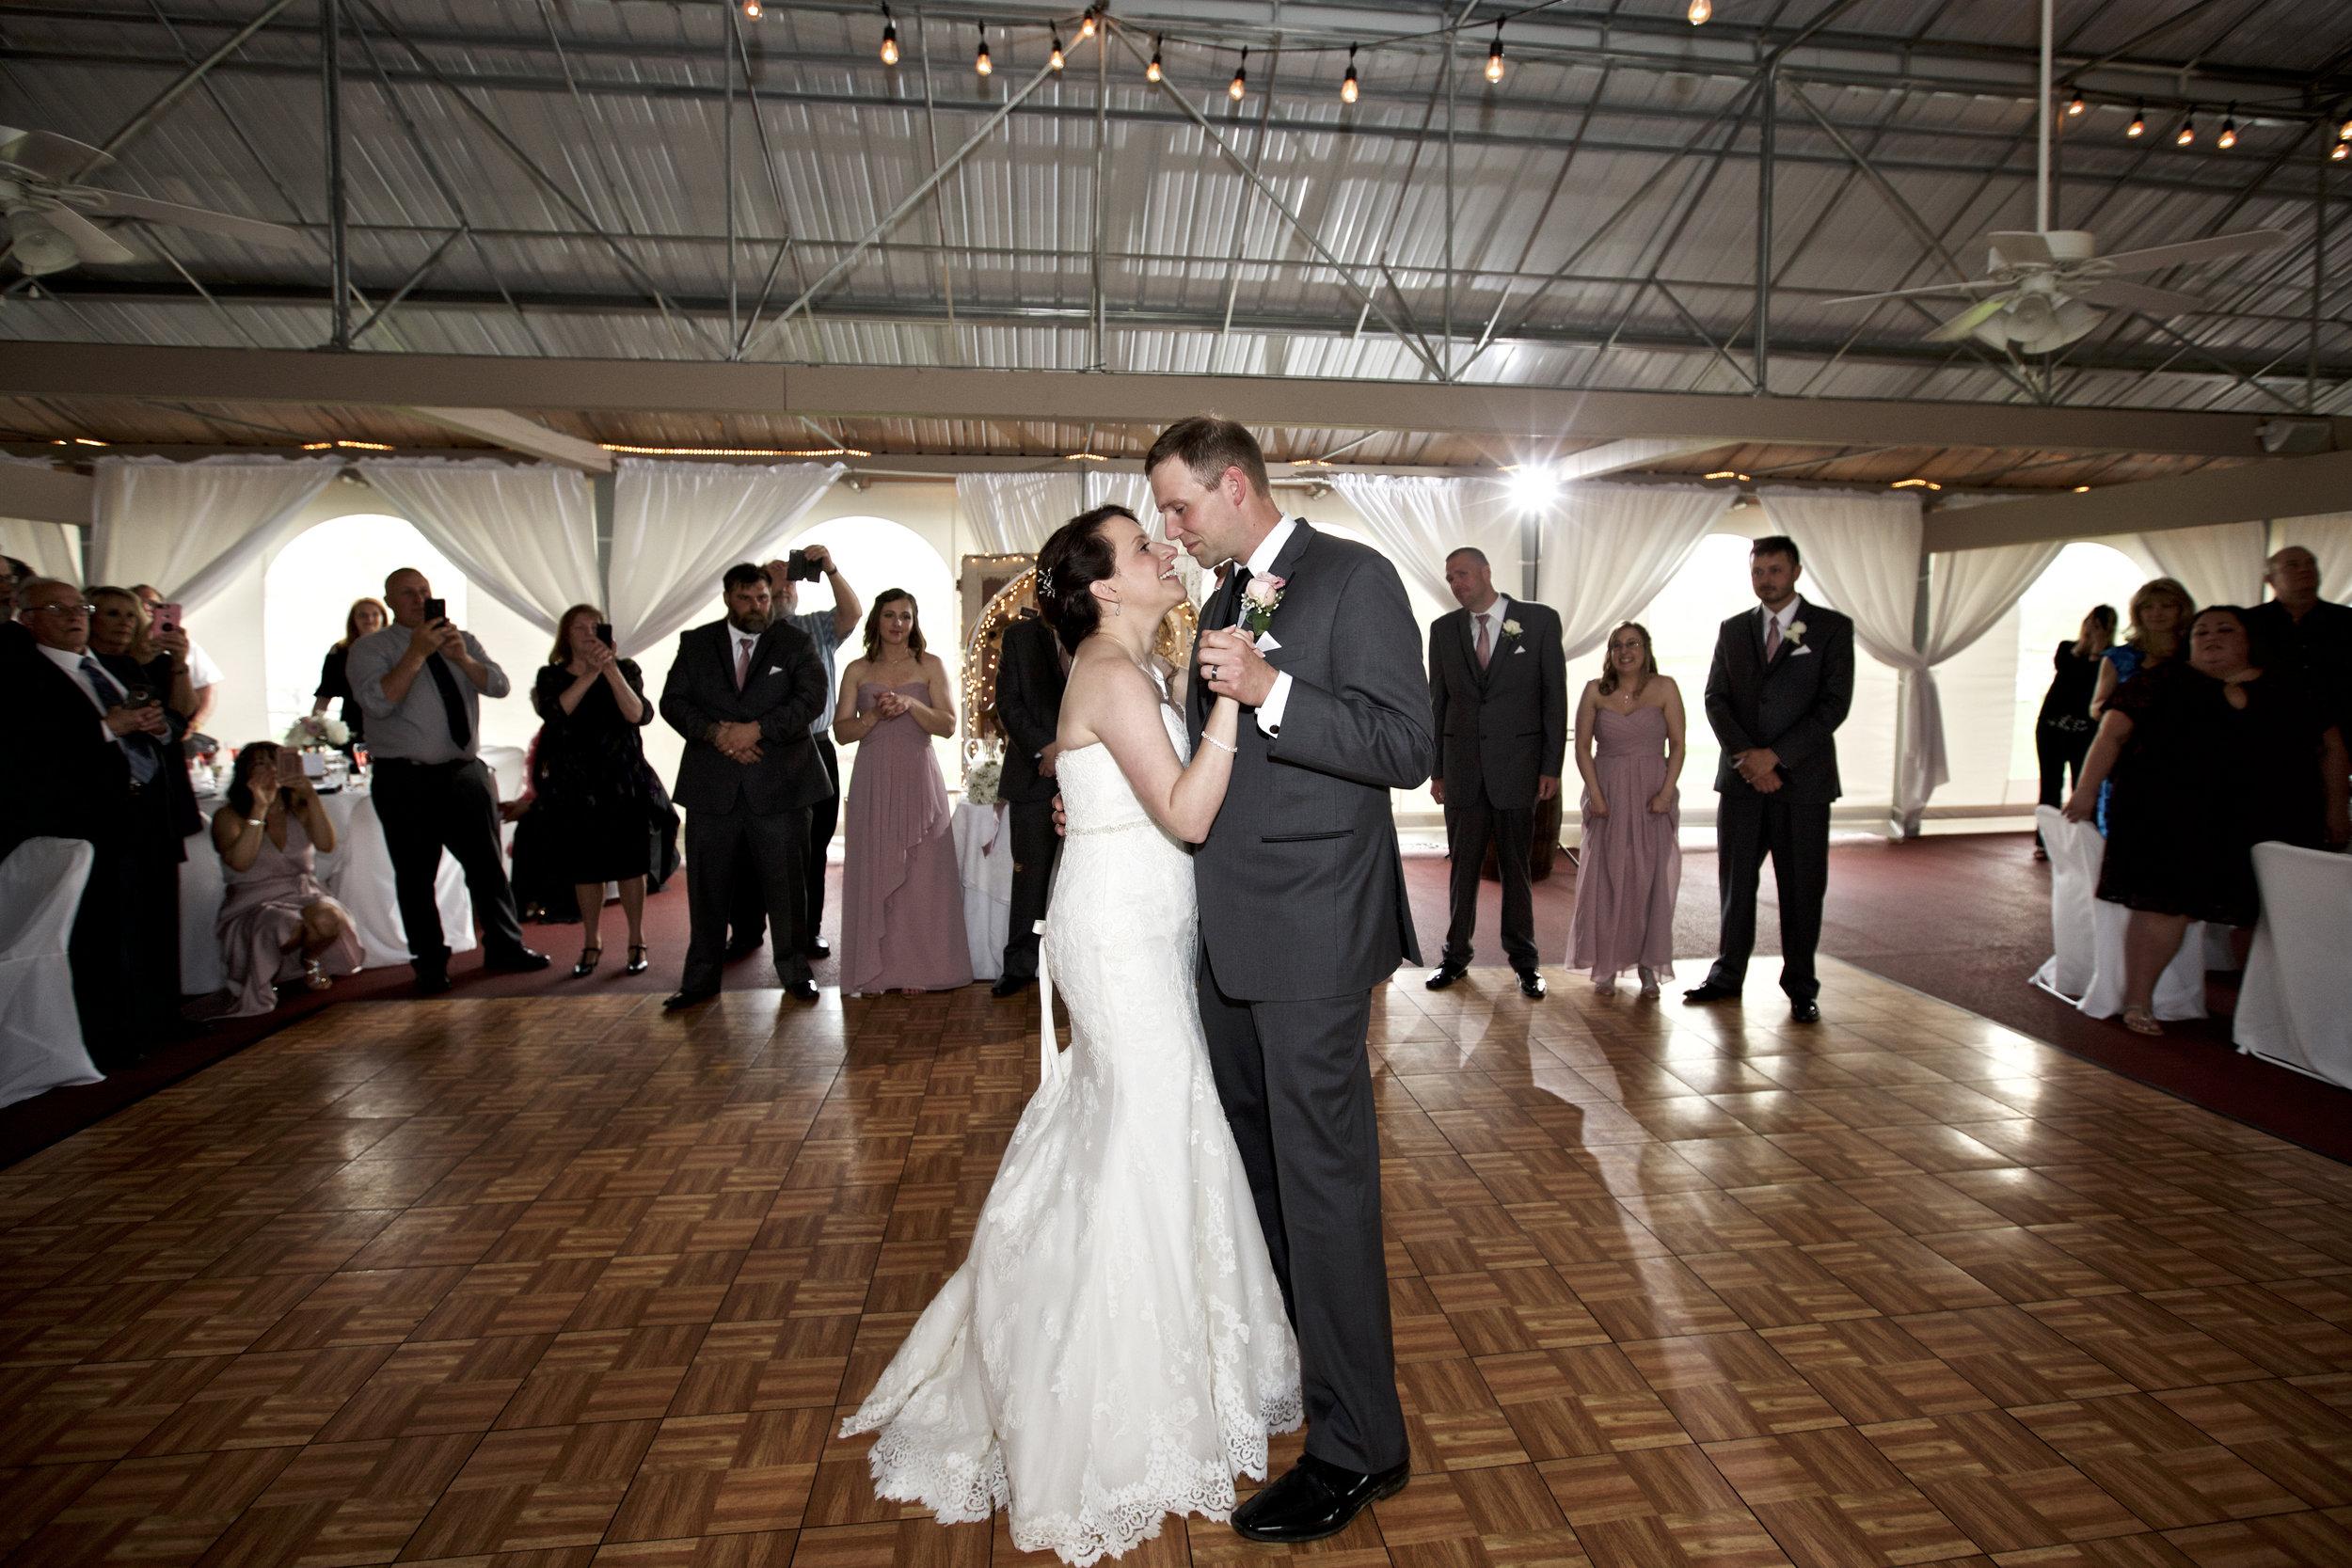 Lippincott manor wedding, wallkill ny weddings, photography, photos a.jpg